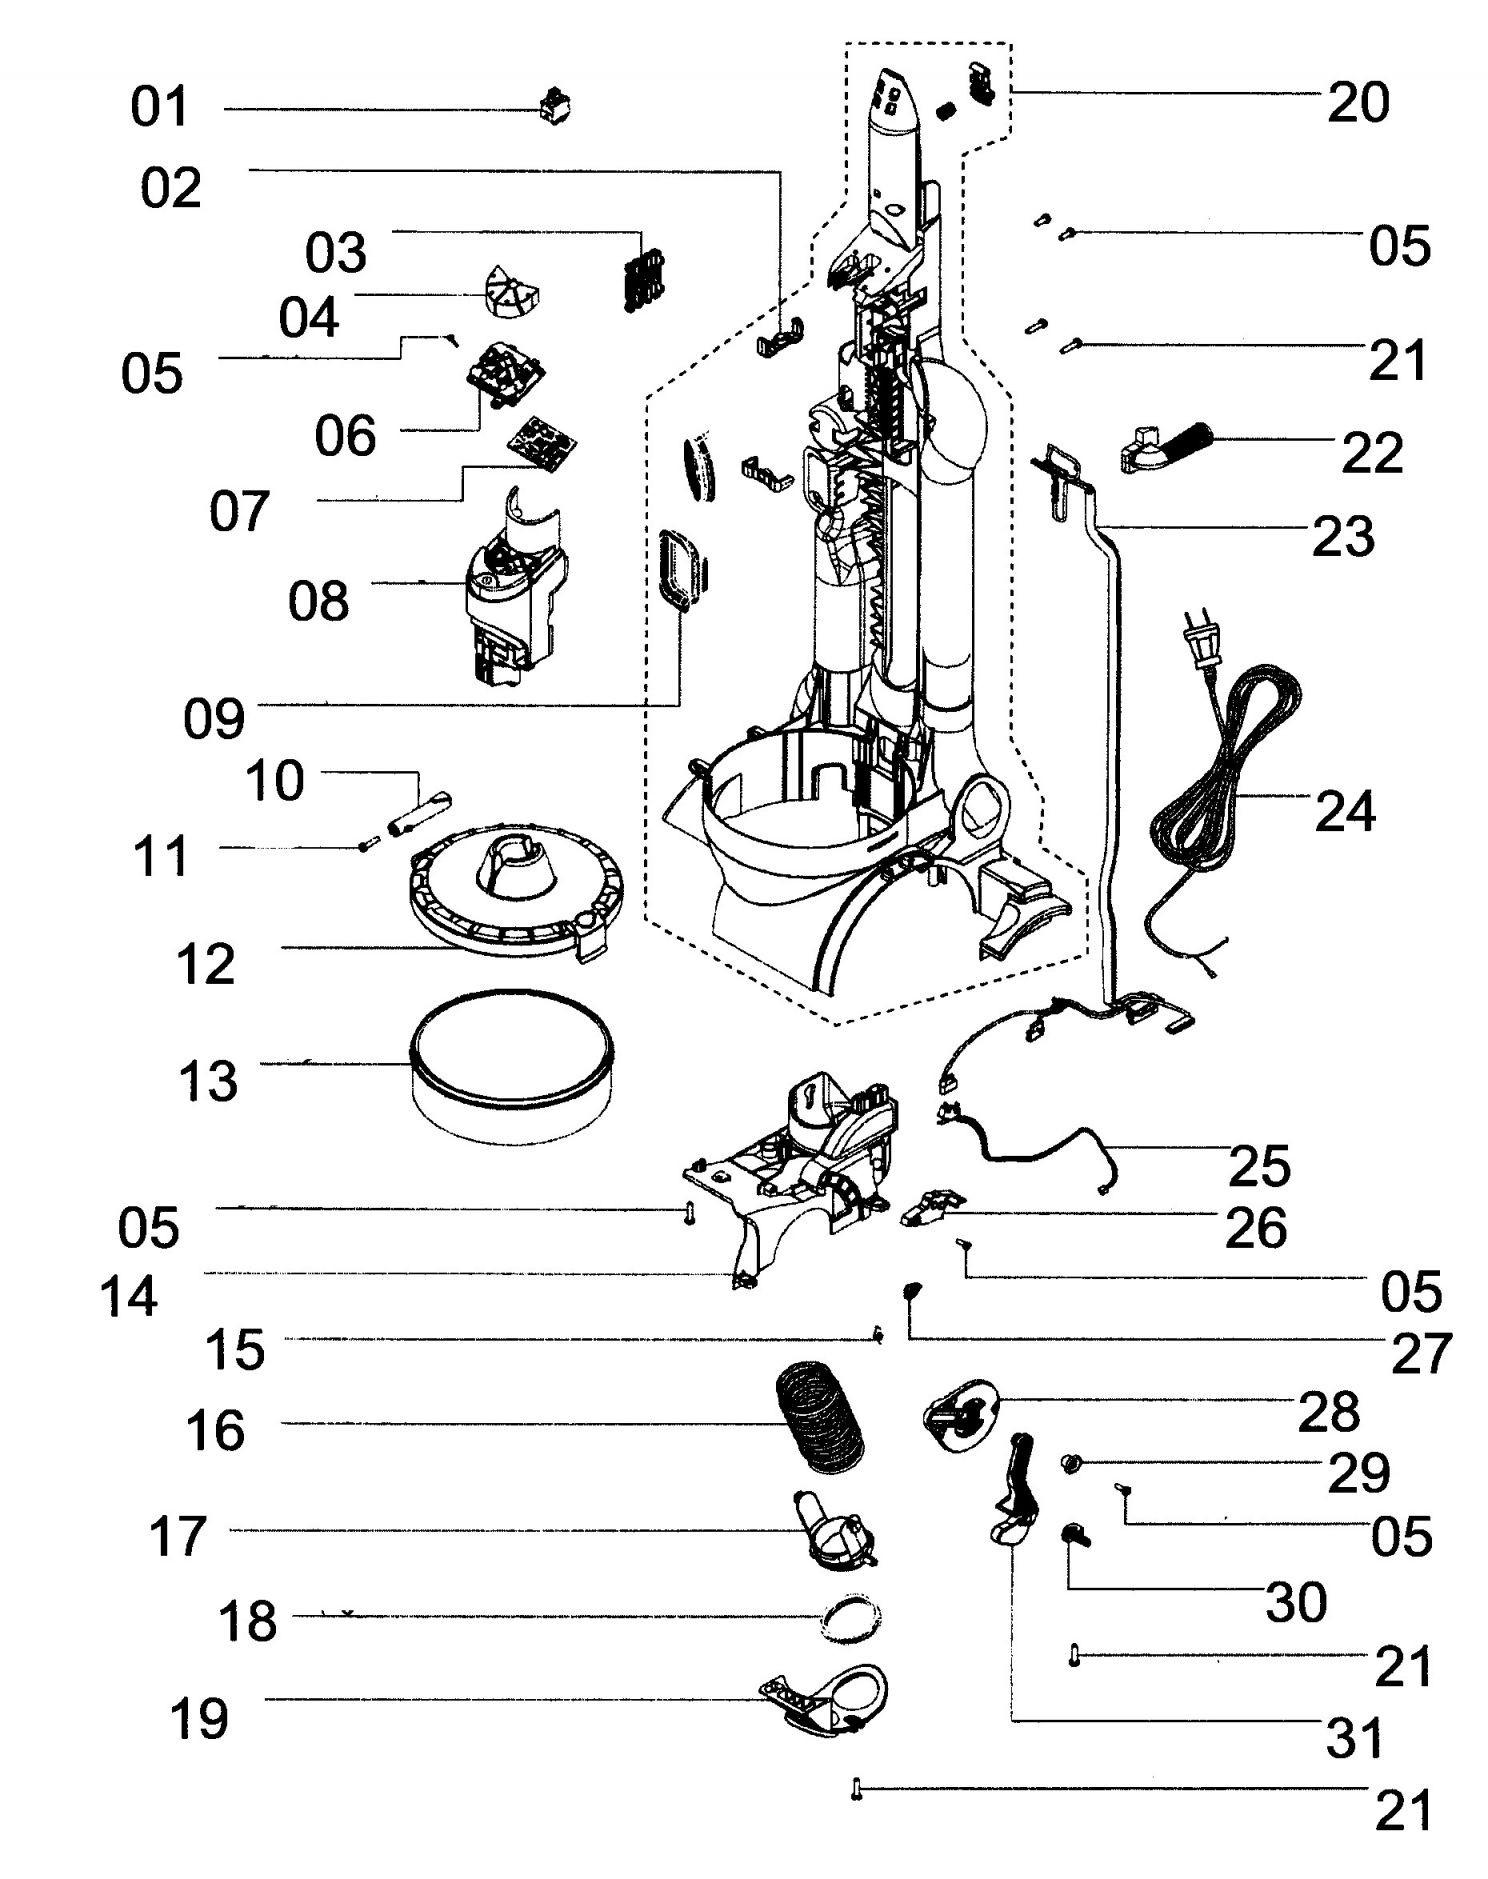 dyson dc17 animal parts diagram briggs and stratton 158cc carburetor my wiring